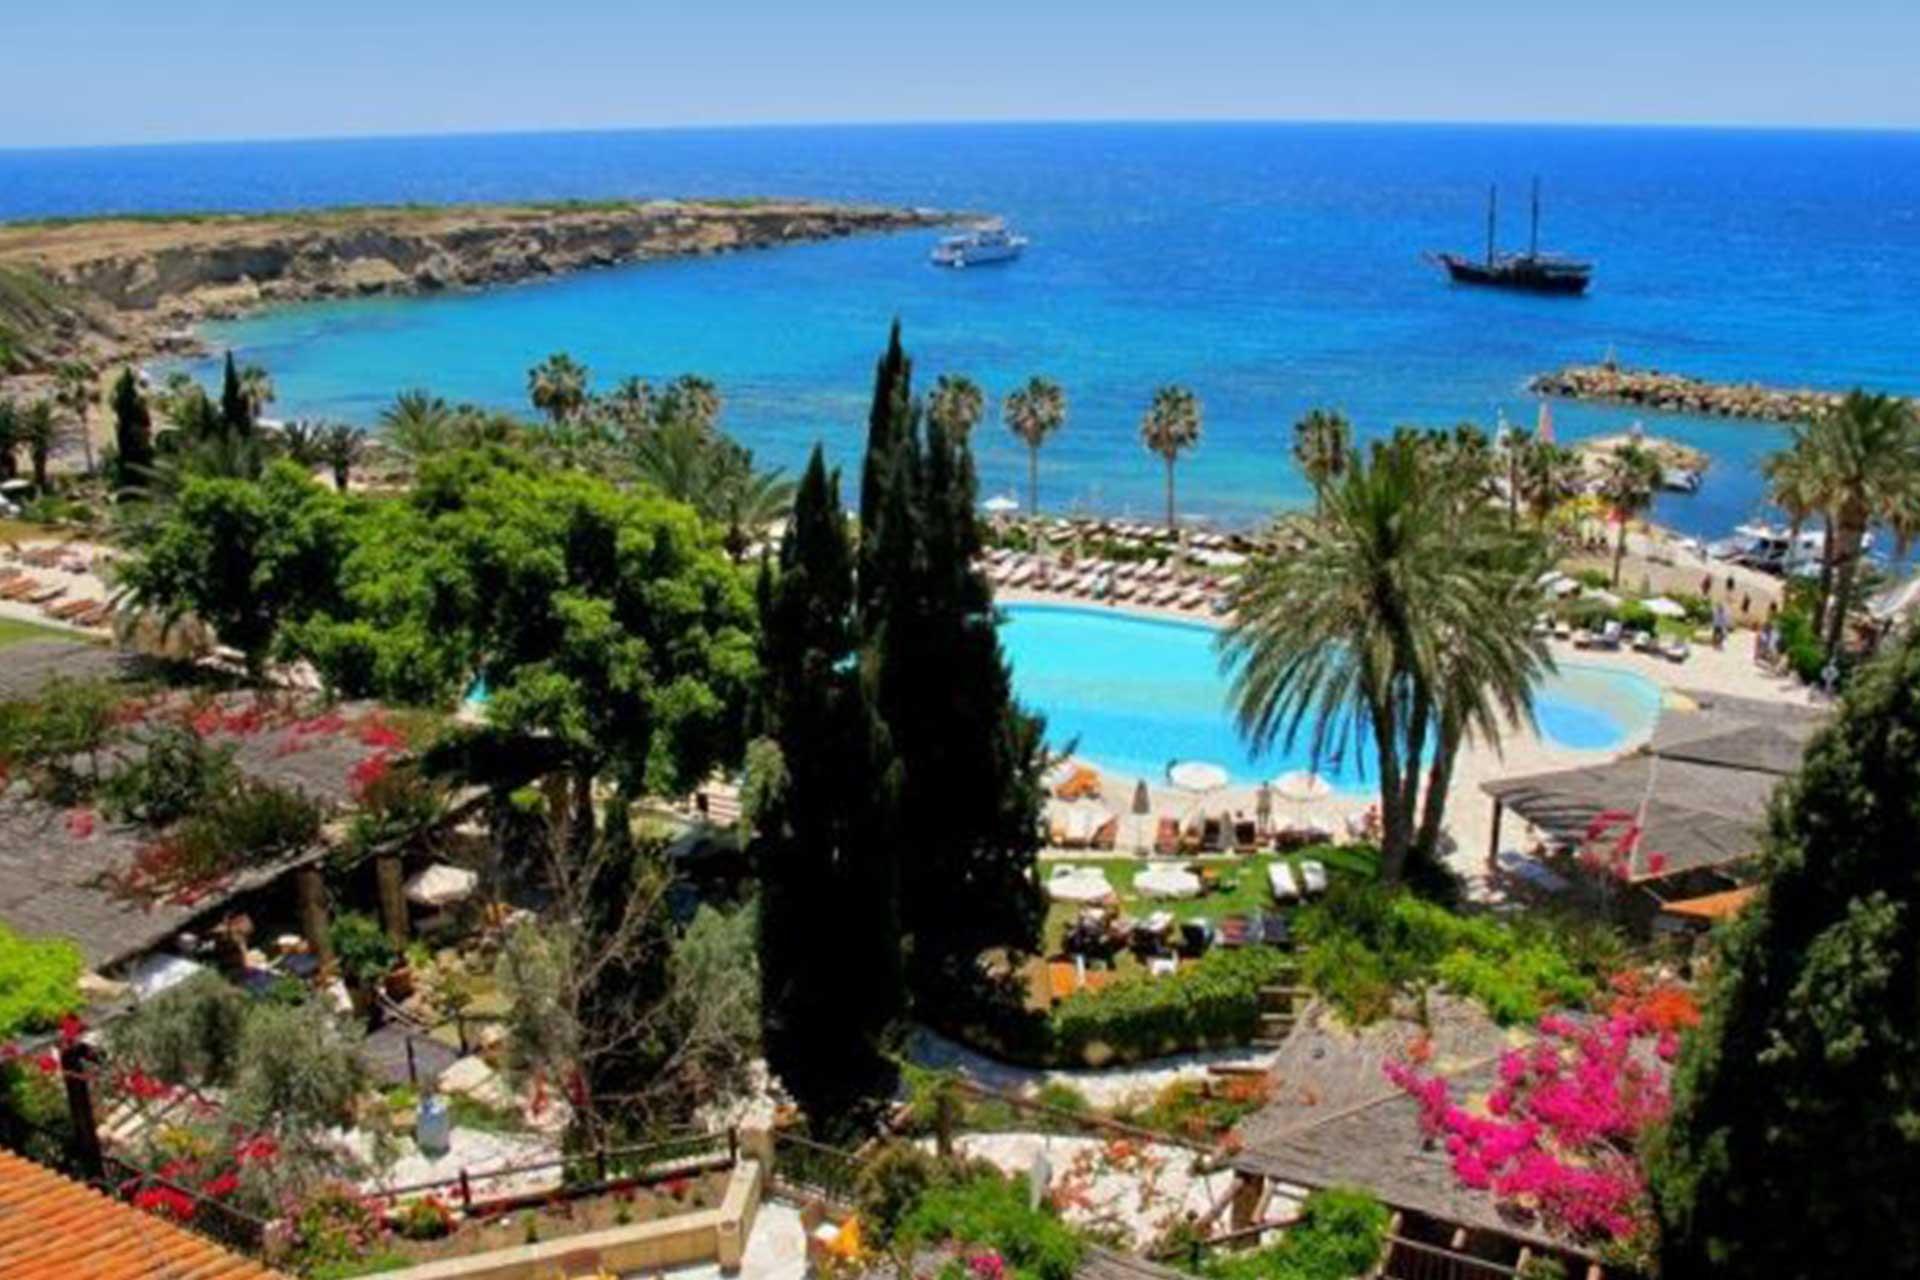 ELEMEC GBC - Projects, Coral Beach Hotel